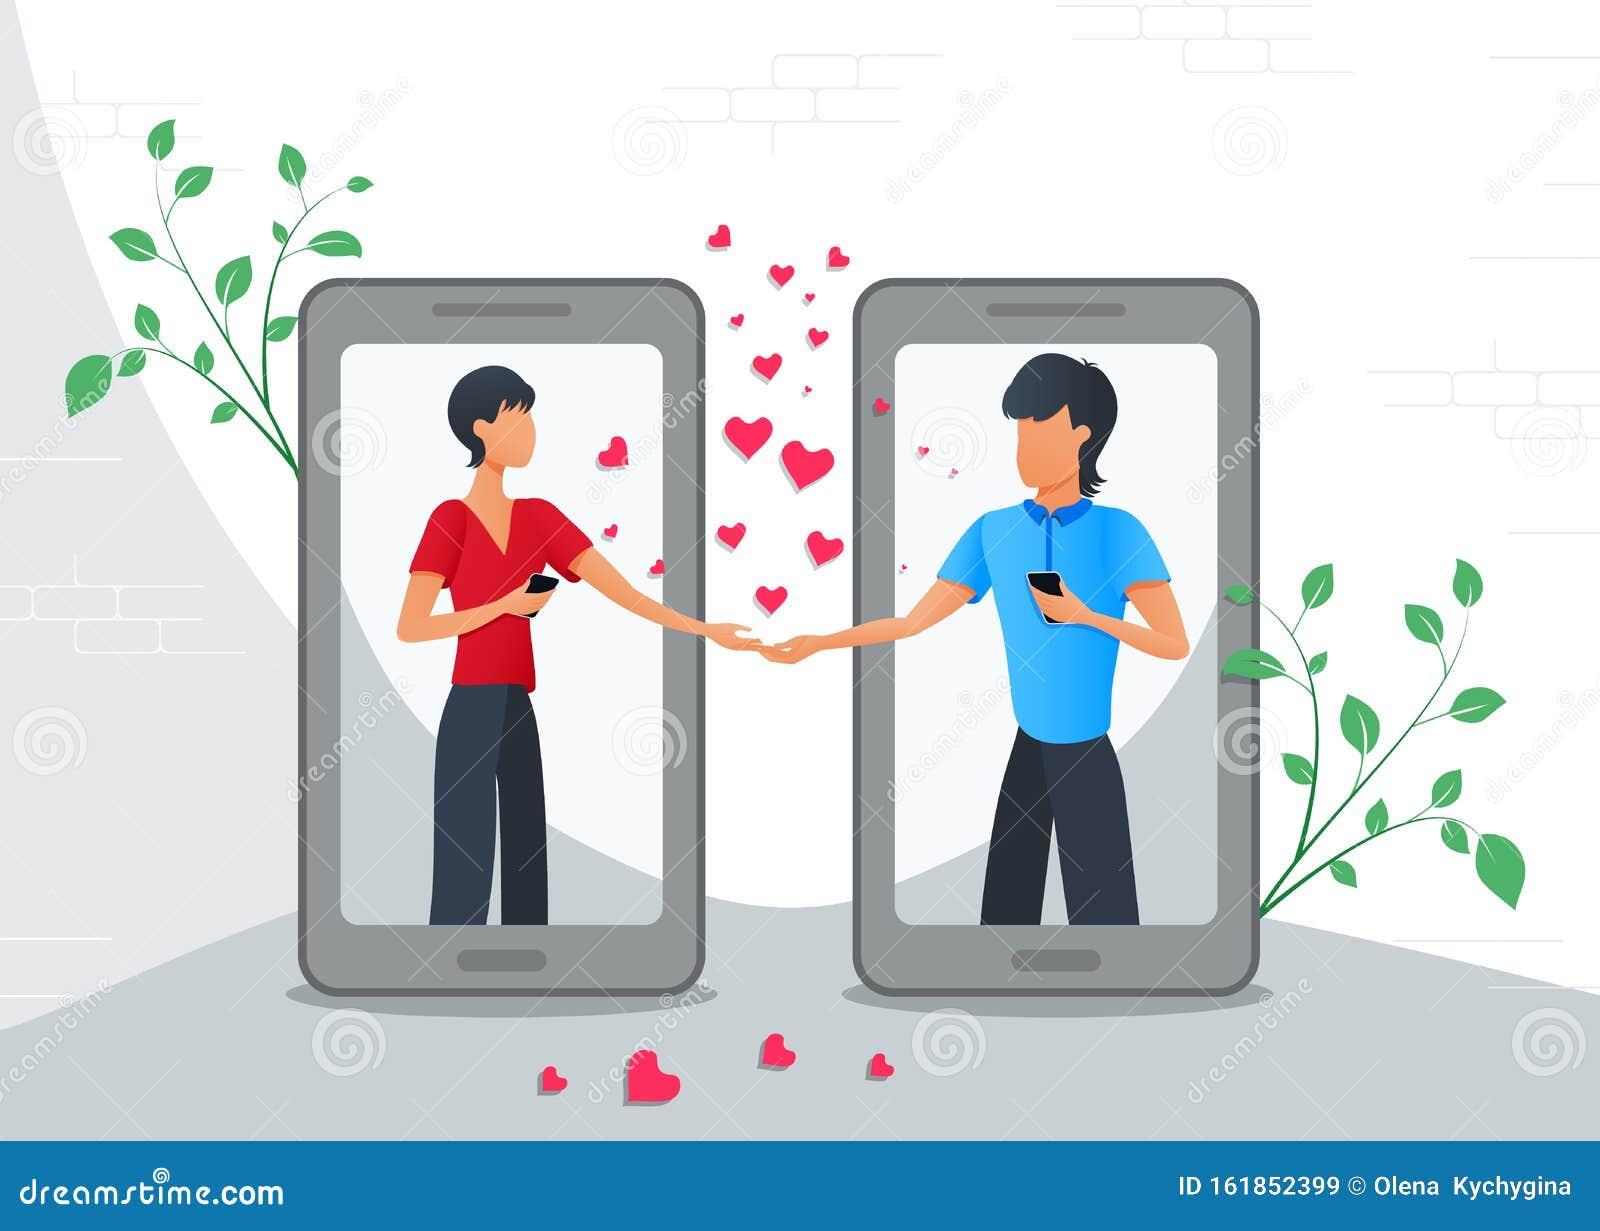 aayyaa| Social Online Dating Community - Magazinul web Chrome